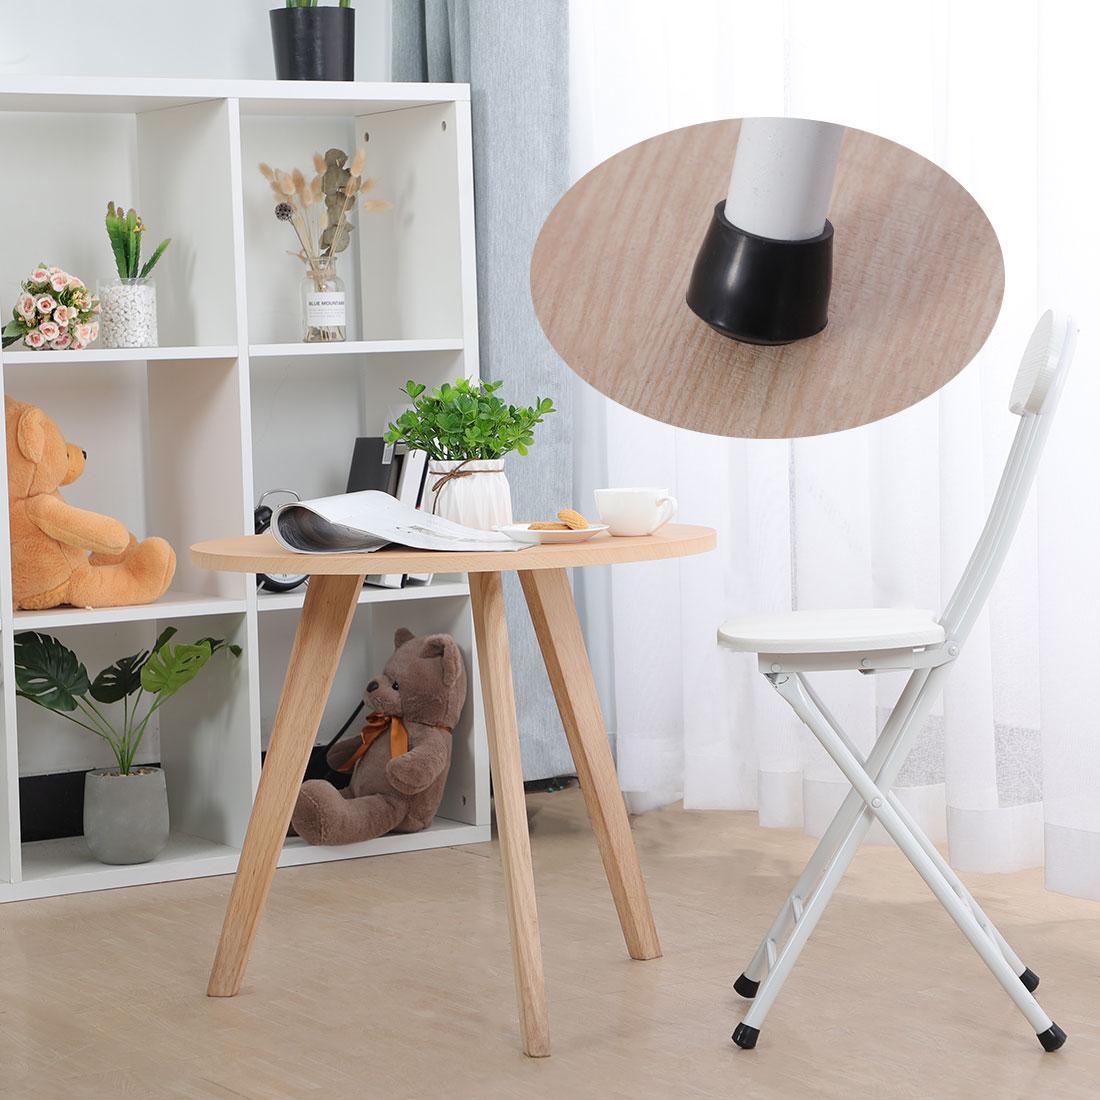 "Rubber Leg Cap Tip Cup Feet Cover 14mm 9/16"" Inner Dia 40pcs for Furniture Table - image 4 de 7"